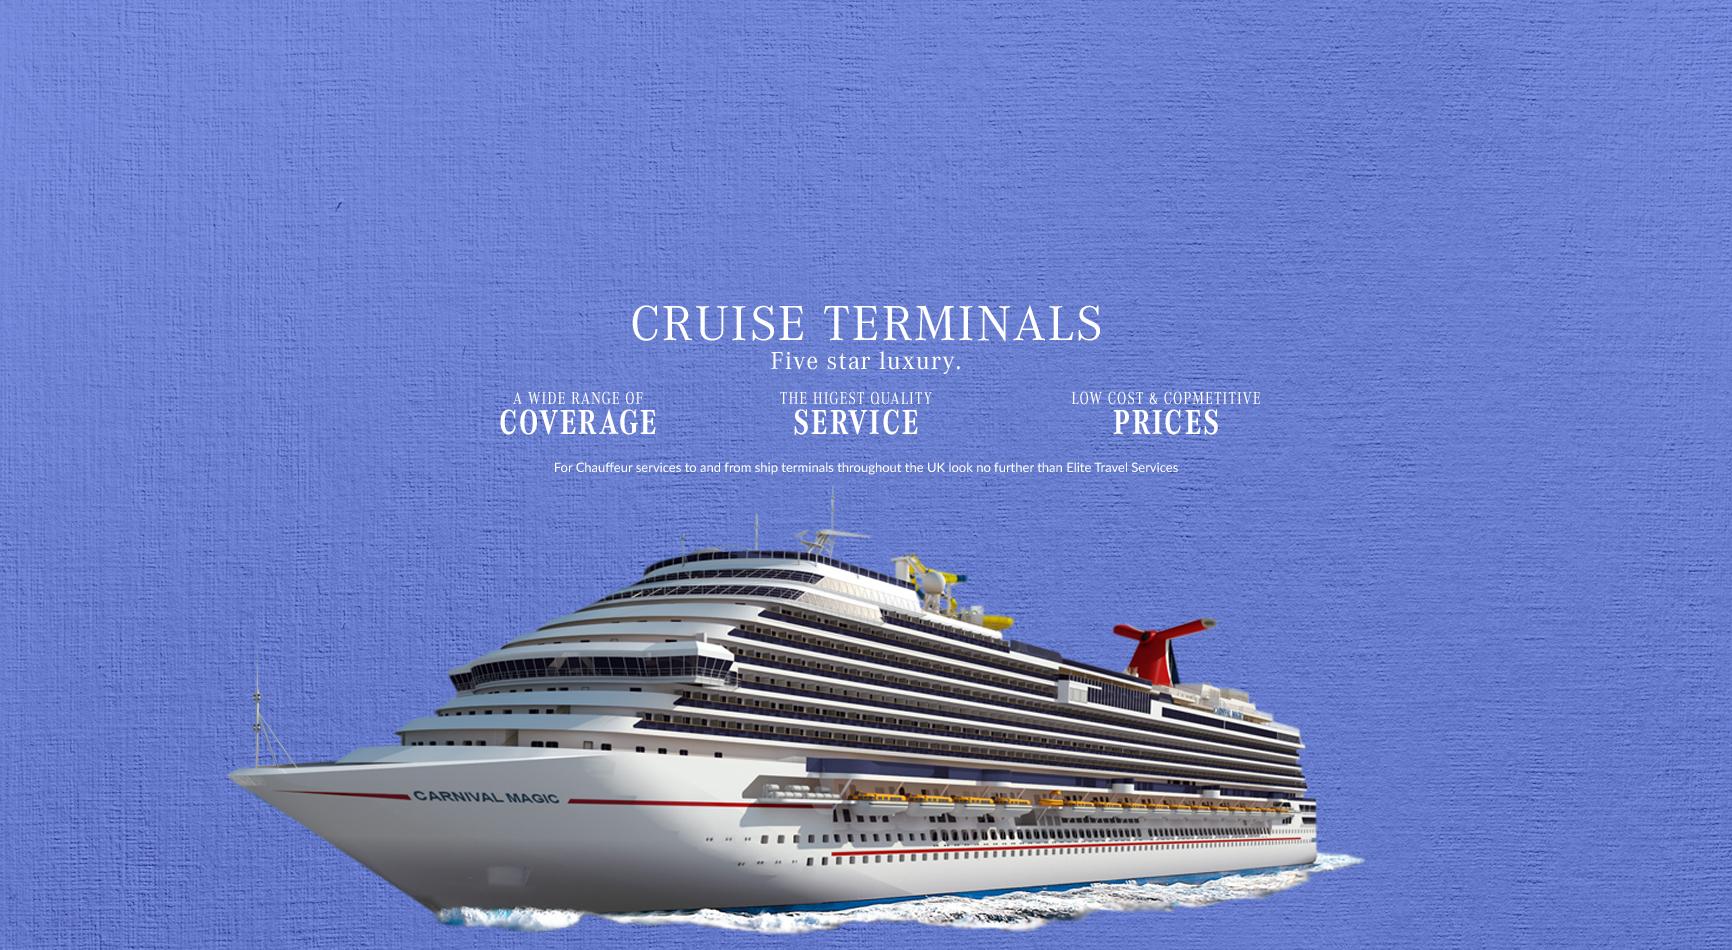 hm-banner-cruise